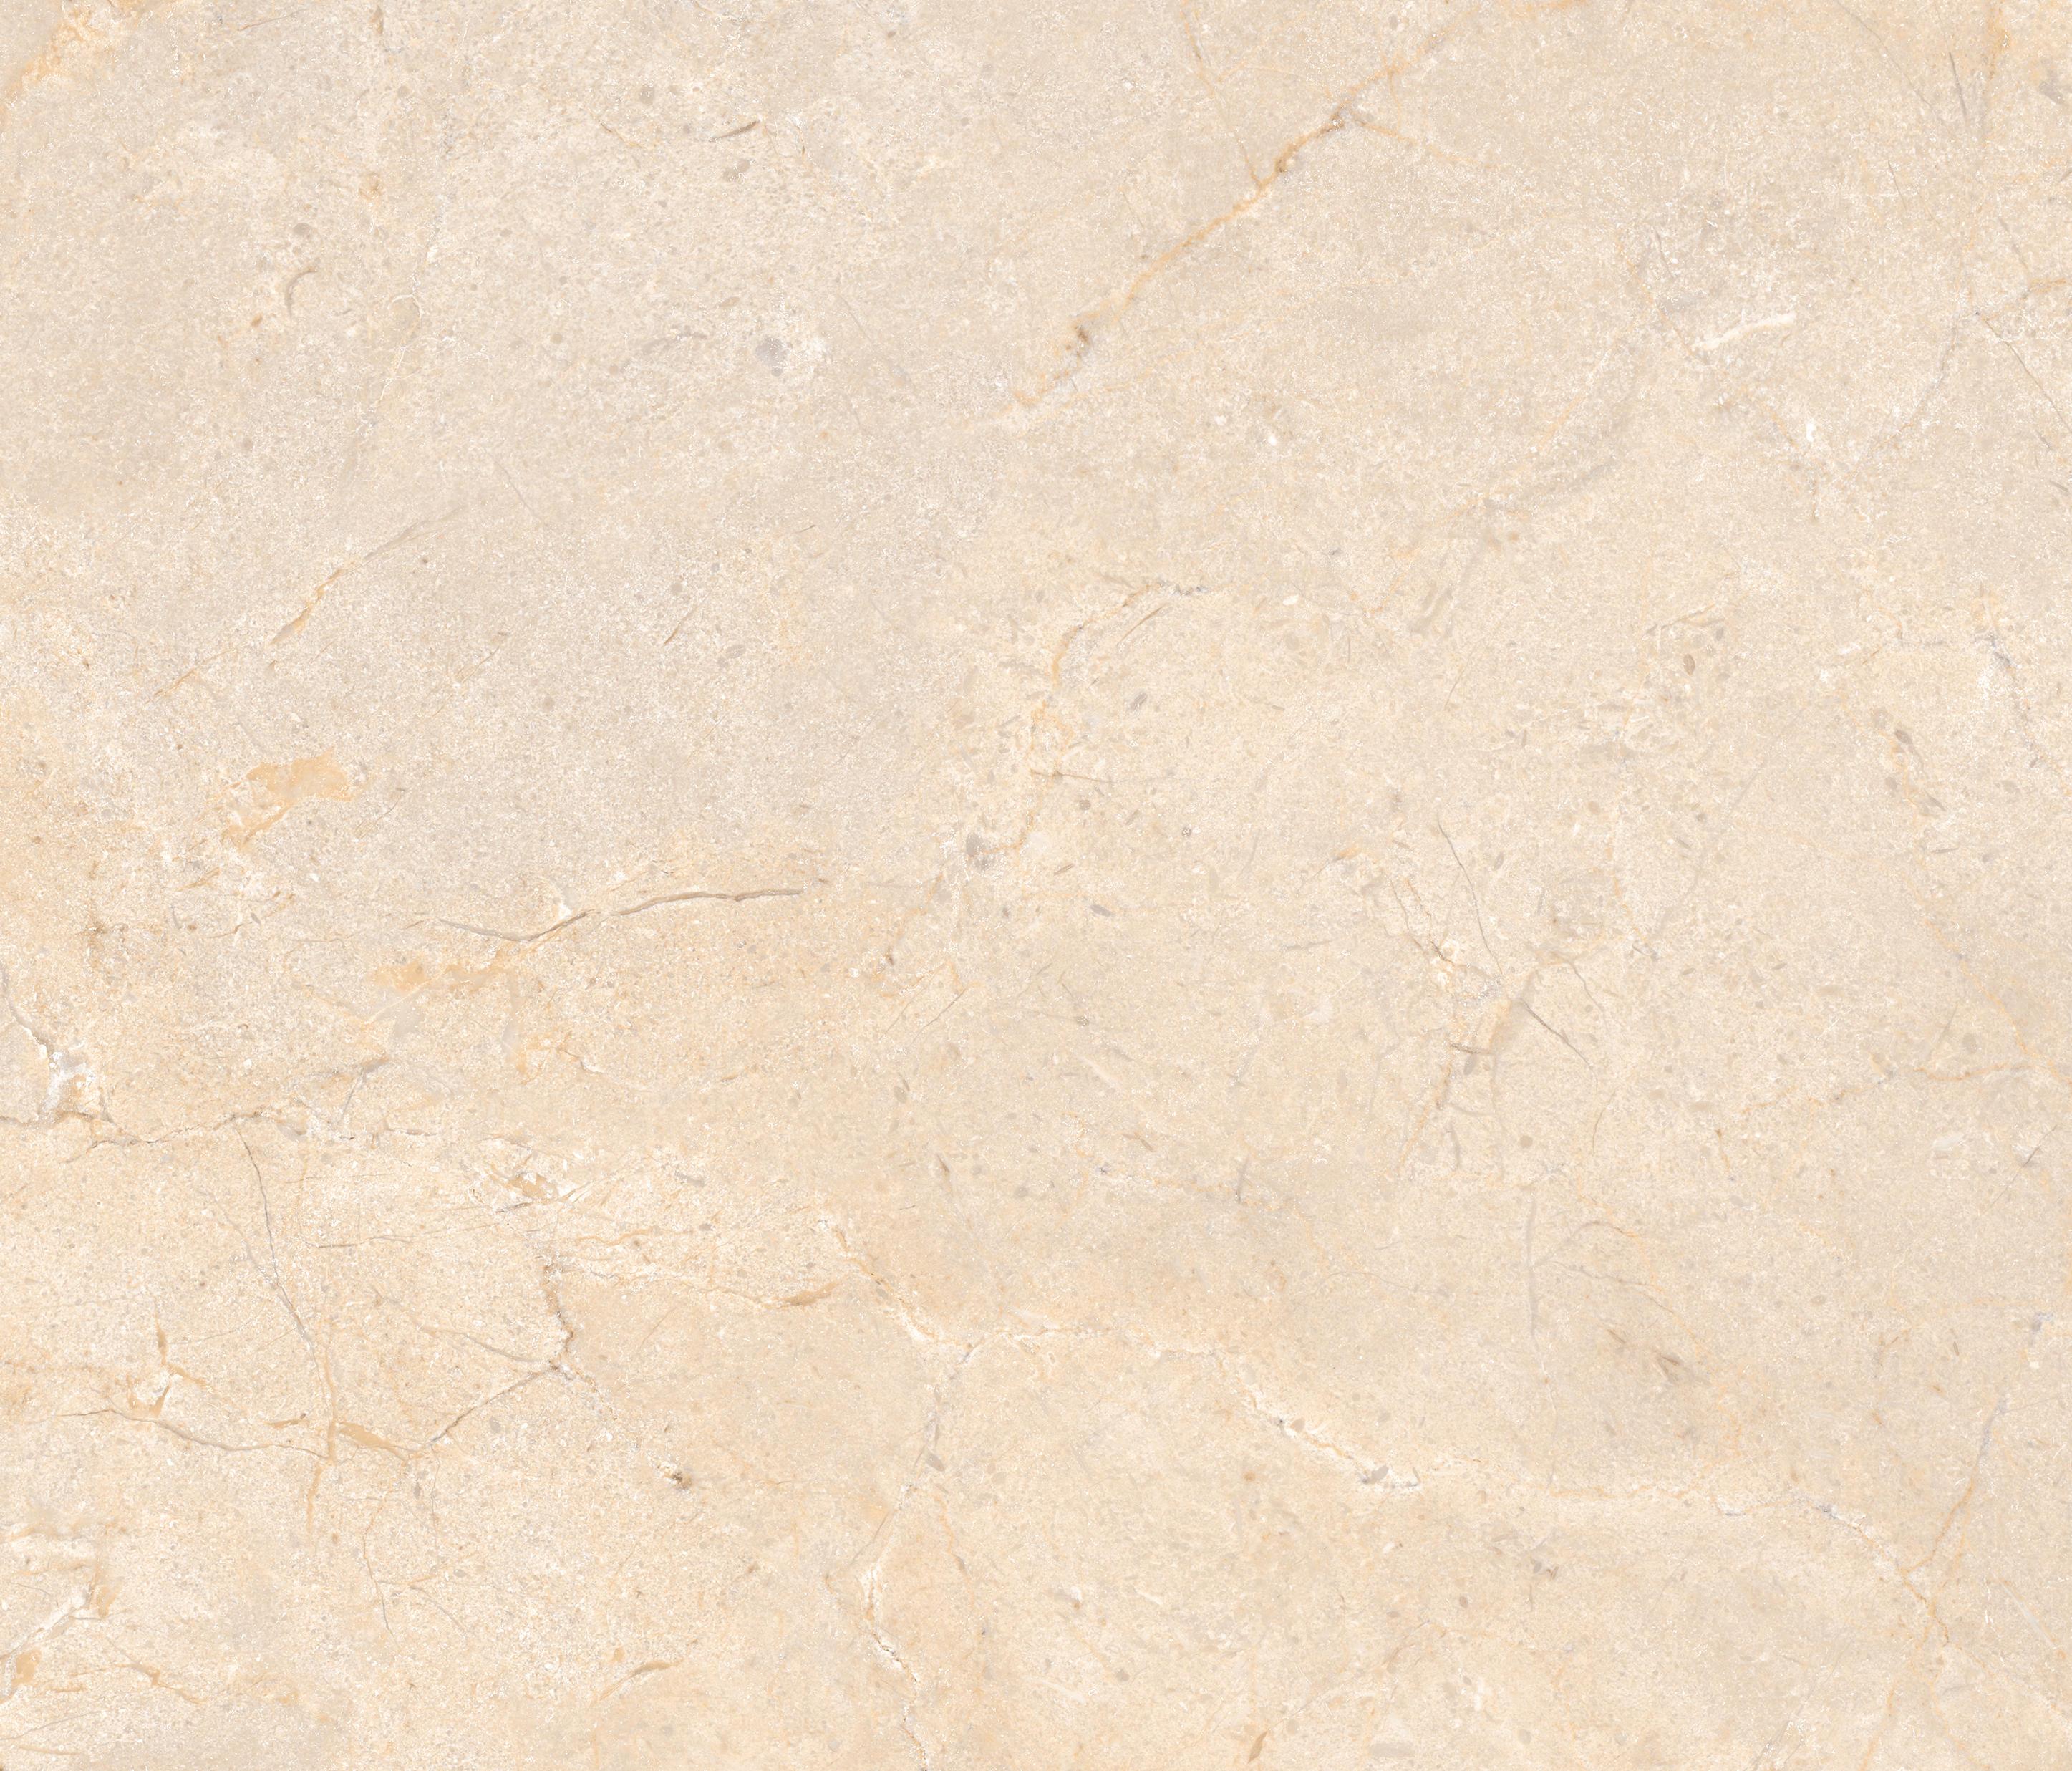 Keraben Fliesen crema marfil crema marfil keramik fliesen keraben architonic